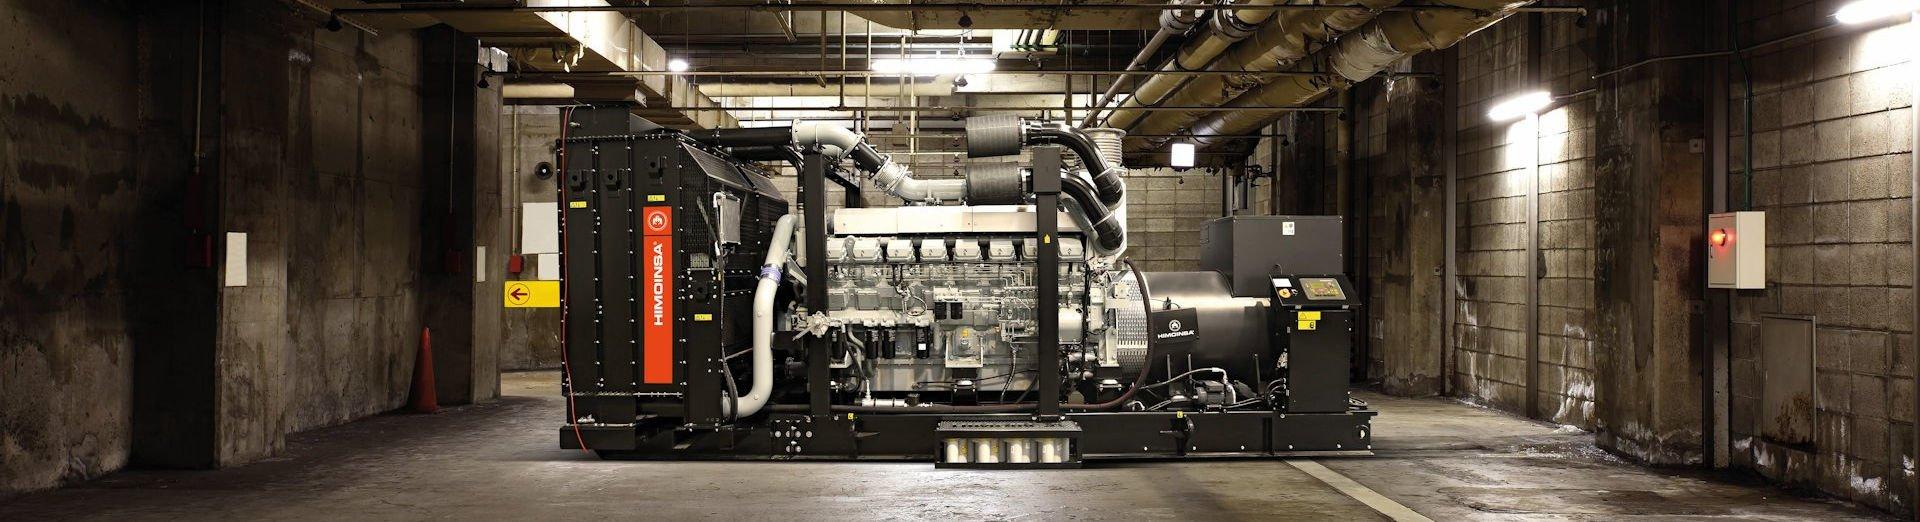 buy diesel generator ipswich